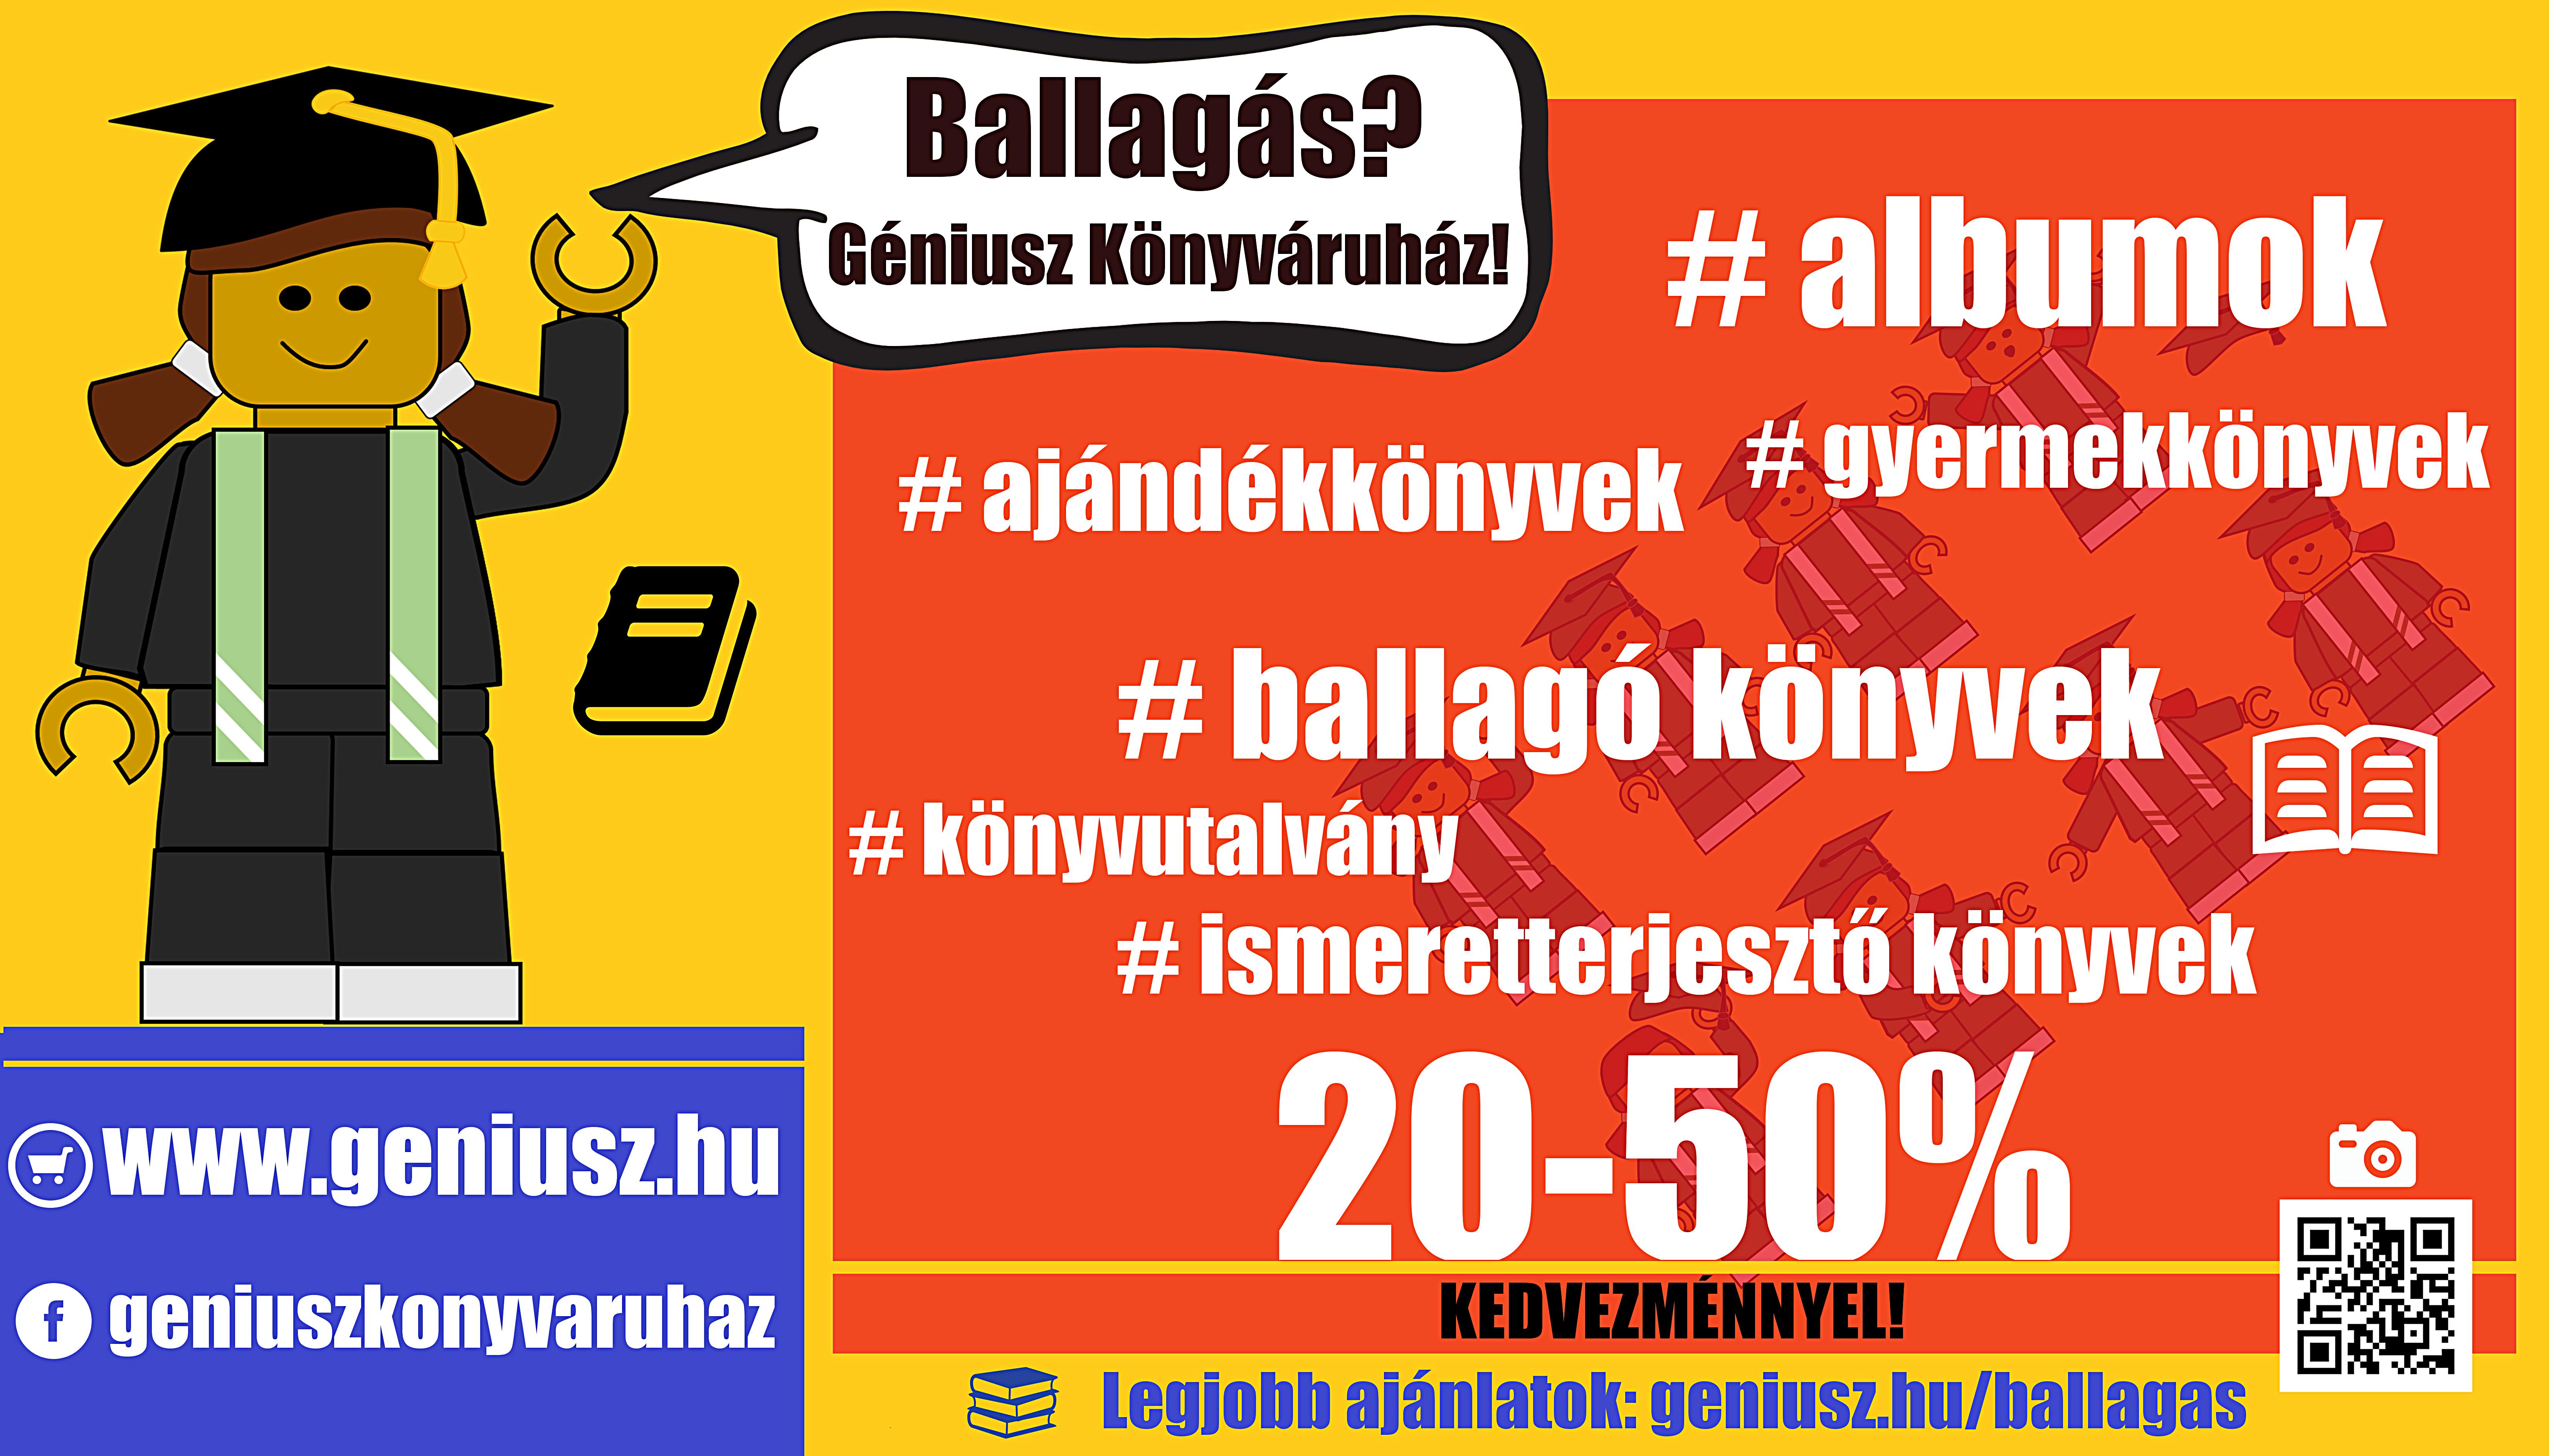 ballagas_2017_elesitett_2.png